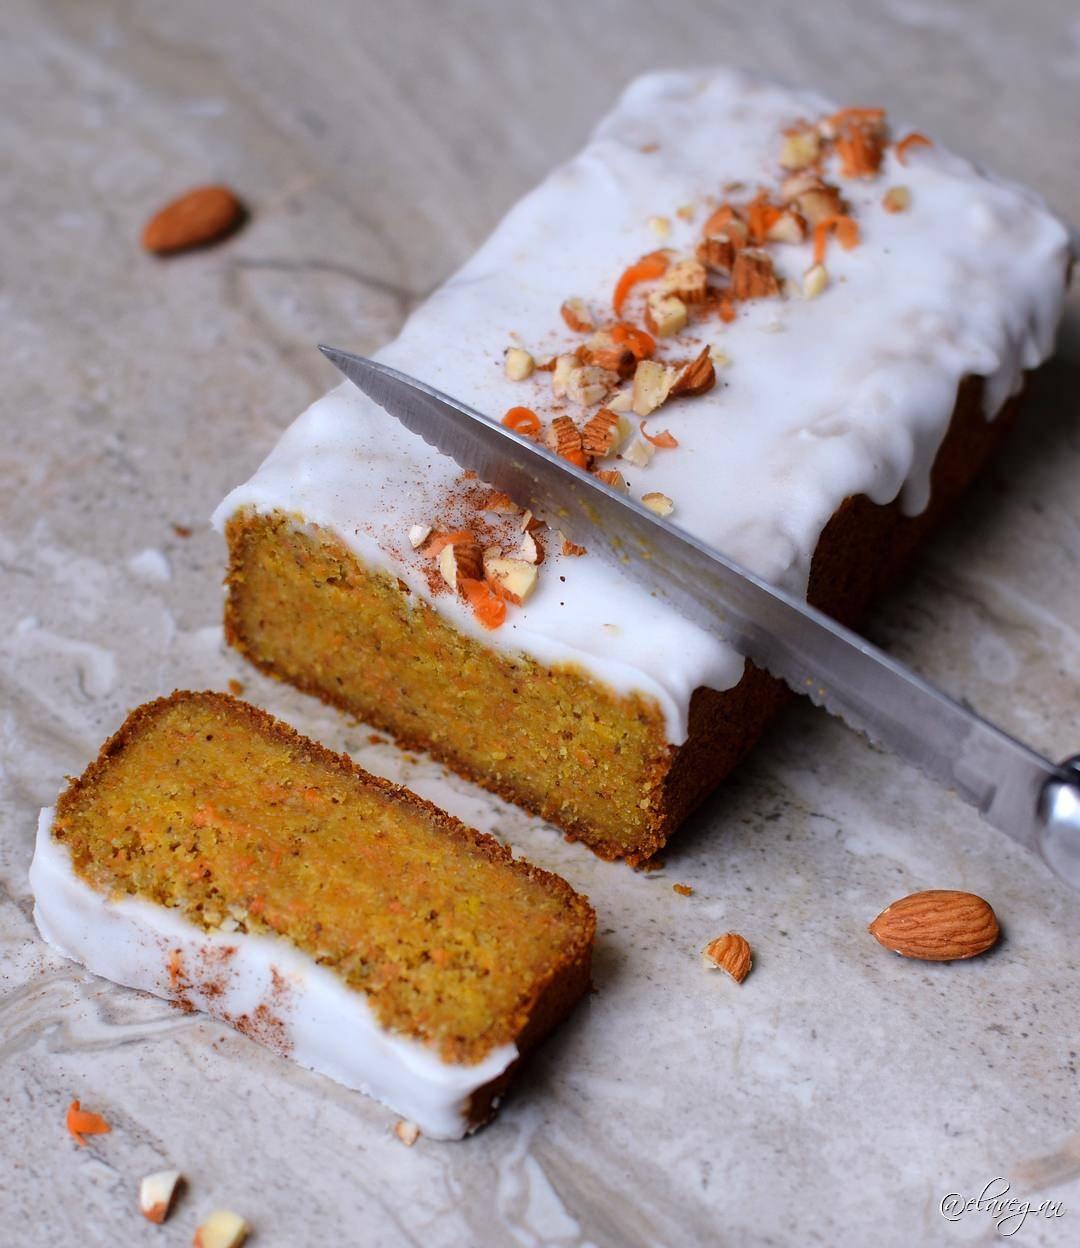 Gluten Free Cake Recipes  Vegan gluten free carrot cake recipe